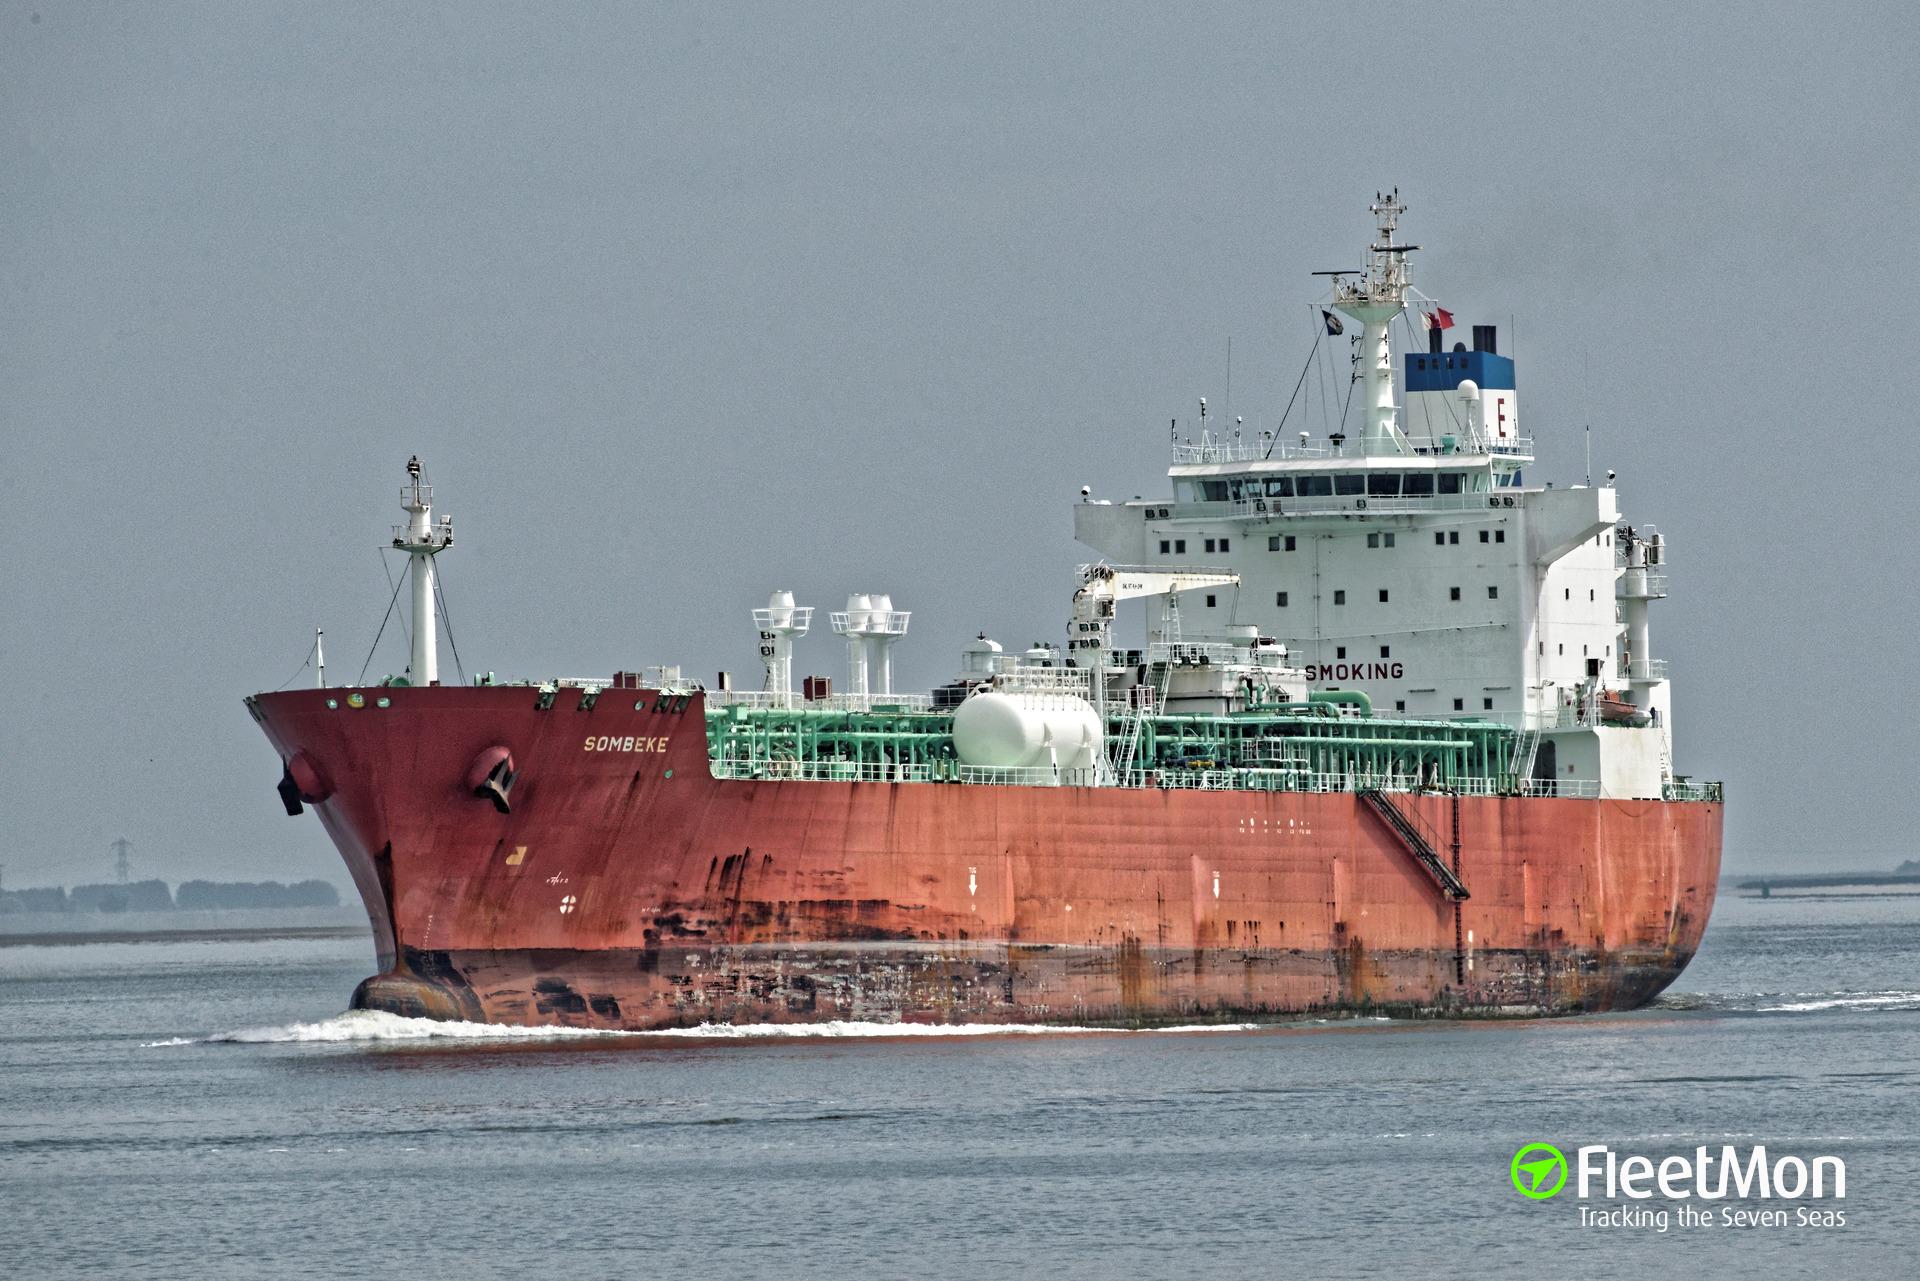 Anhydrous ammonia leak from LPG tanker Sombeke, Houston